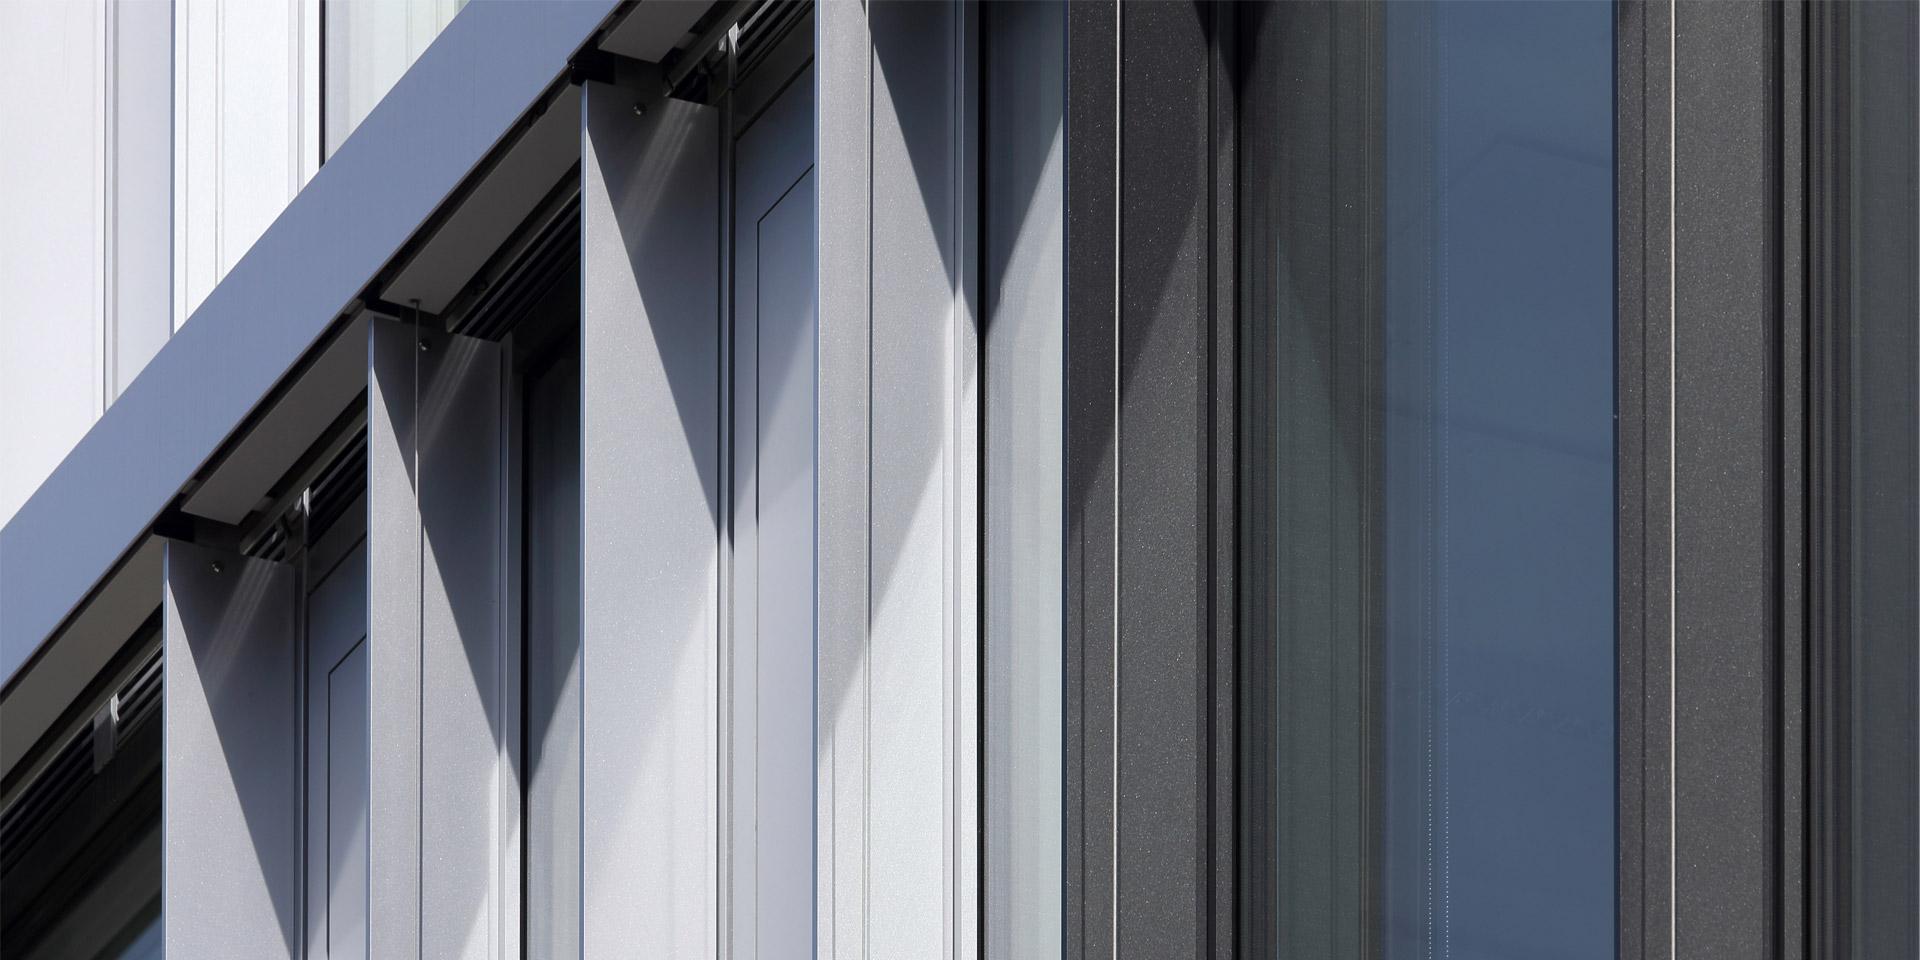 Lackierte Fassadenprofile, Referenz Bürohaus Arabeska in München